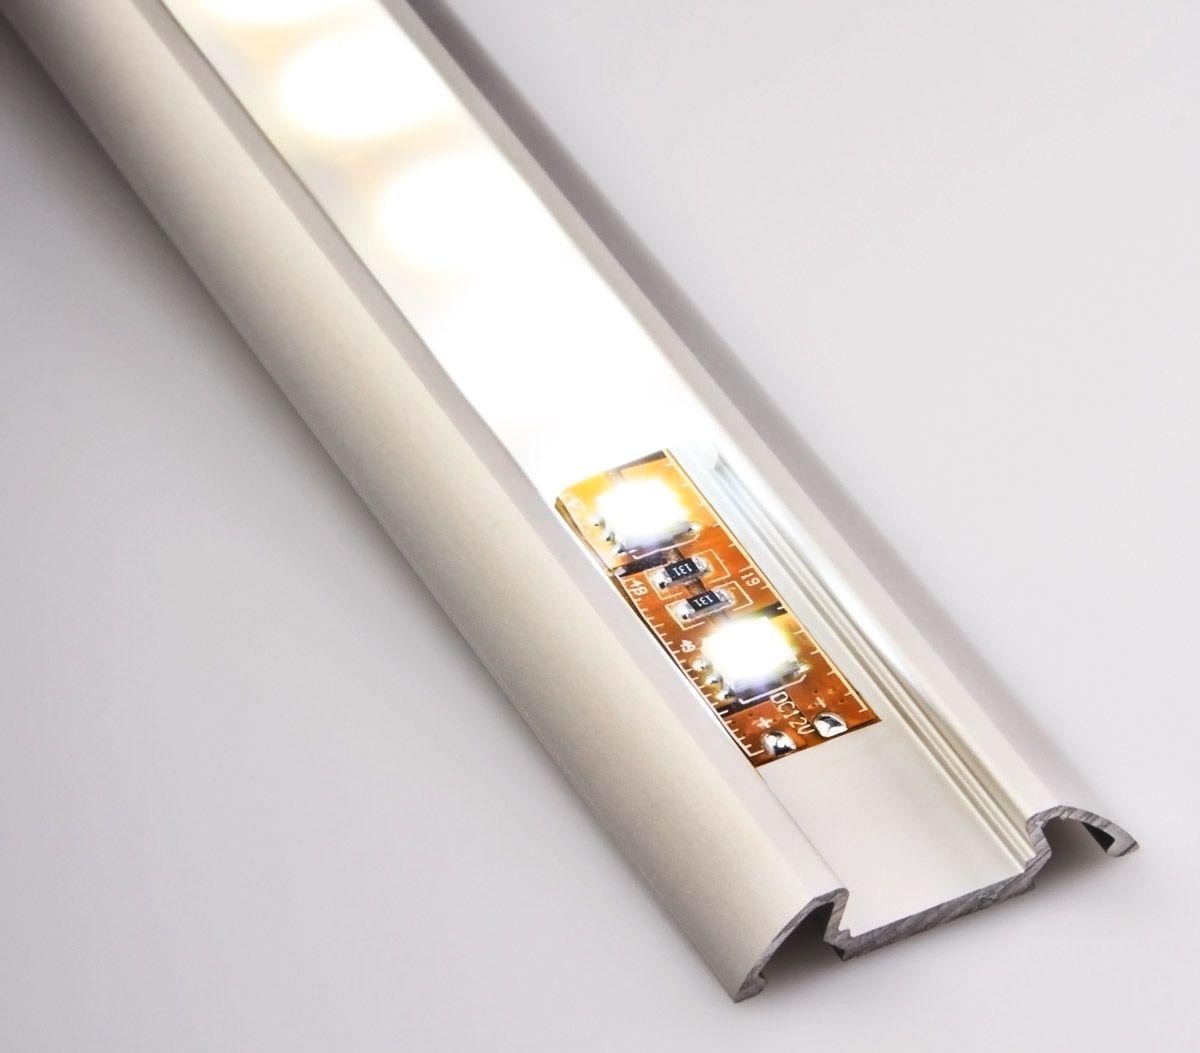 Angled Surface Mount Aluminum Profile Housing for LED